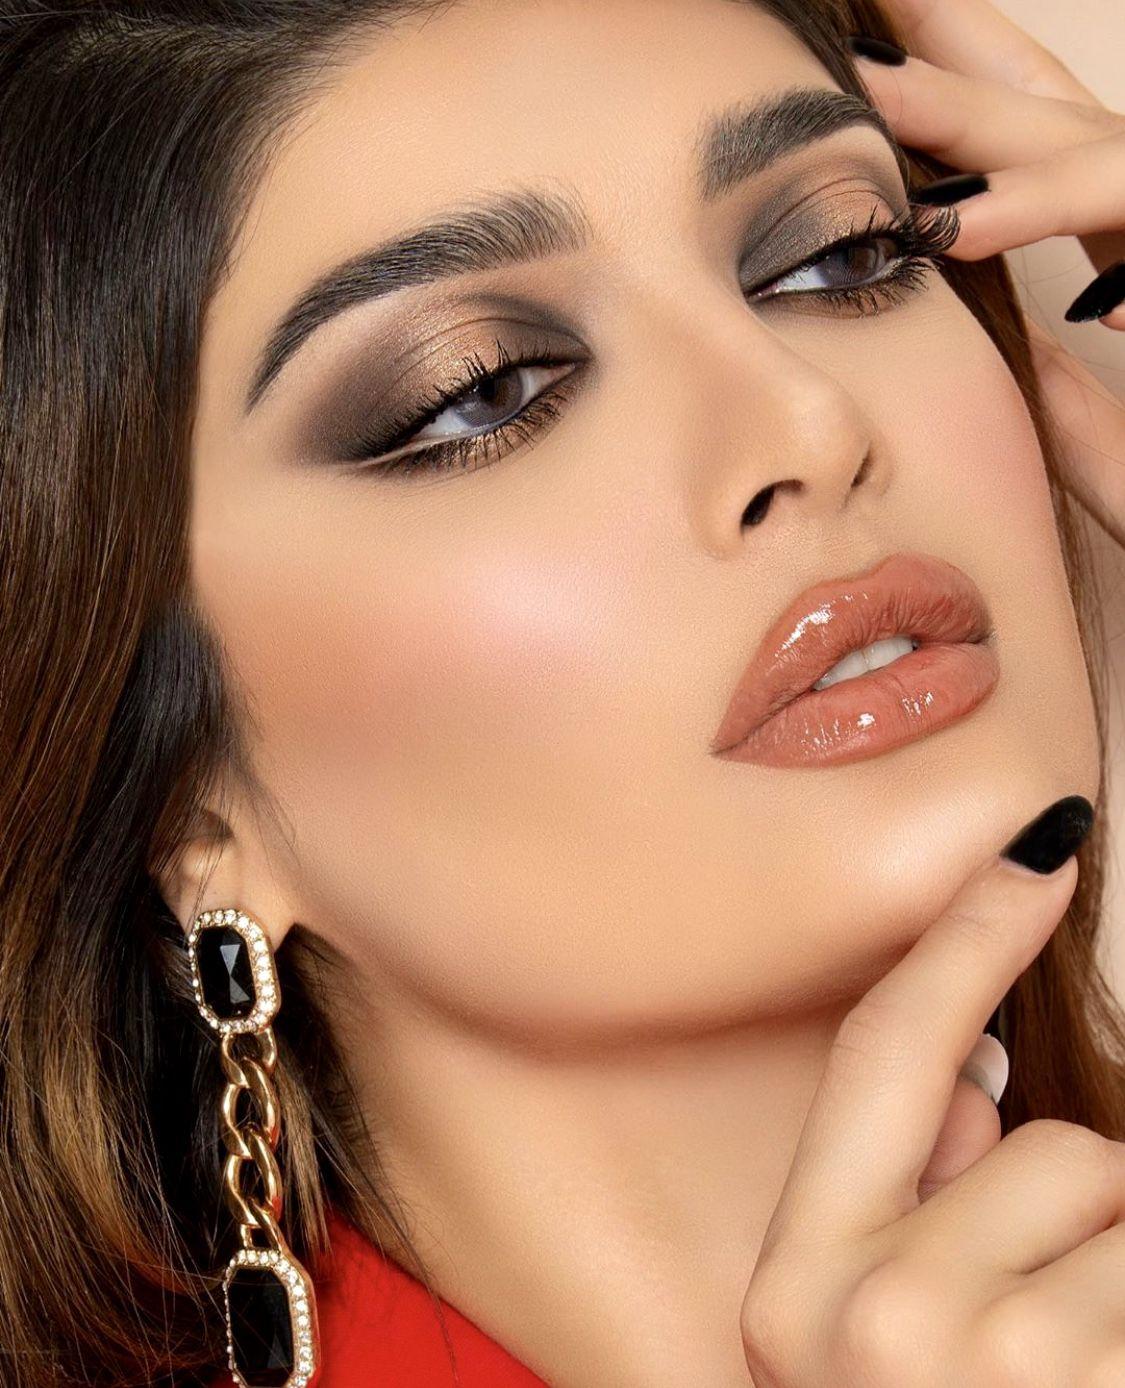 Pin By Sisouka28 On Makeup Middle Eastern Makeup Beautiful Girl Image Makeup